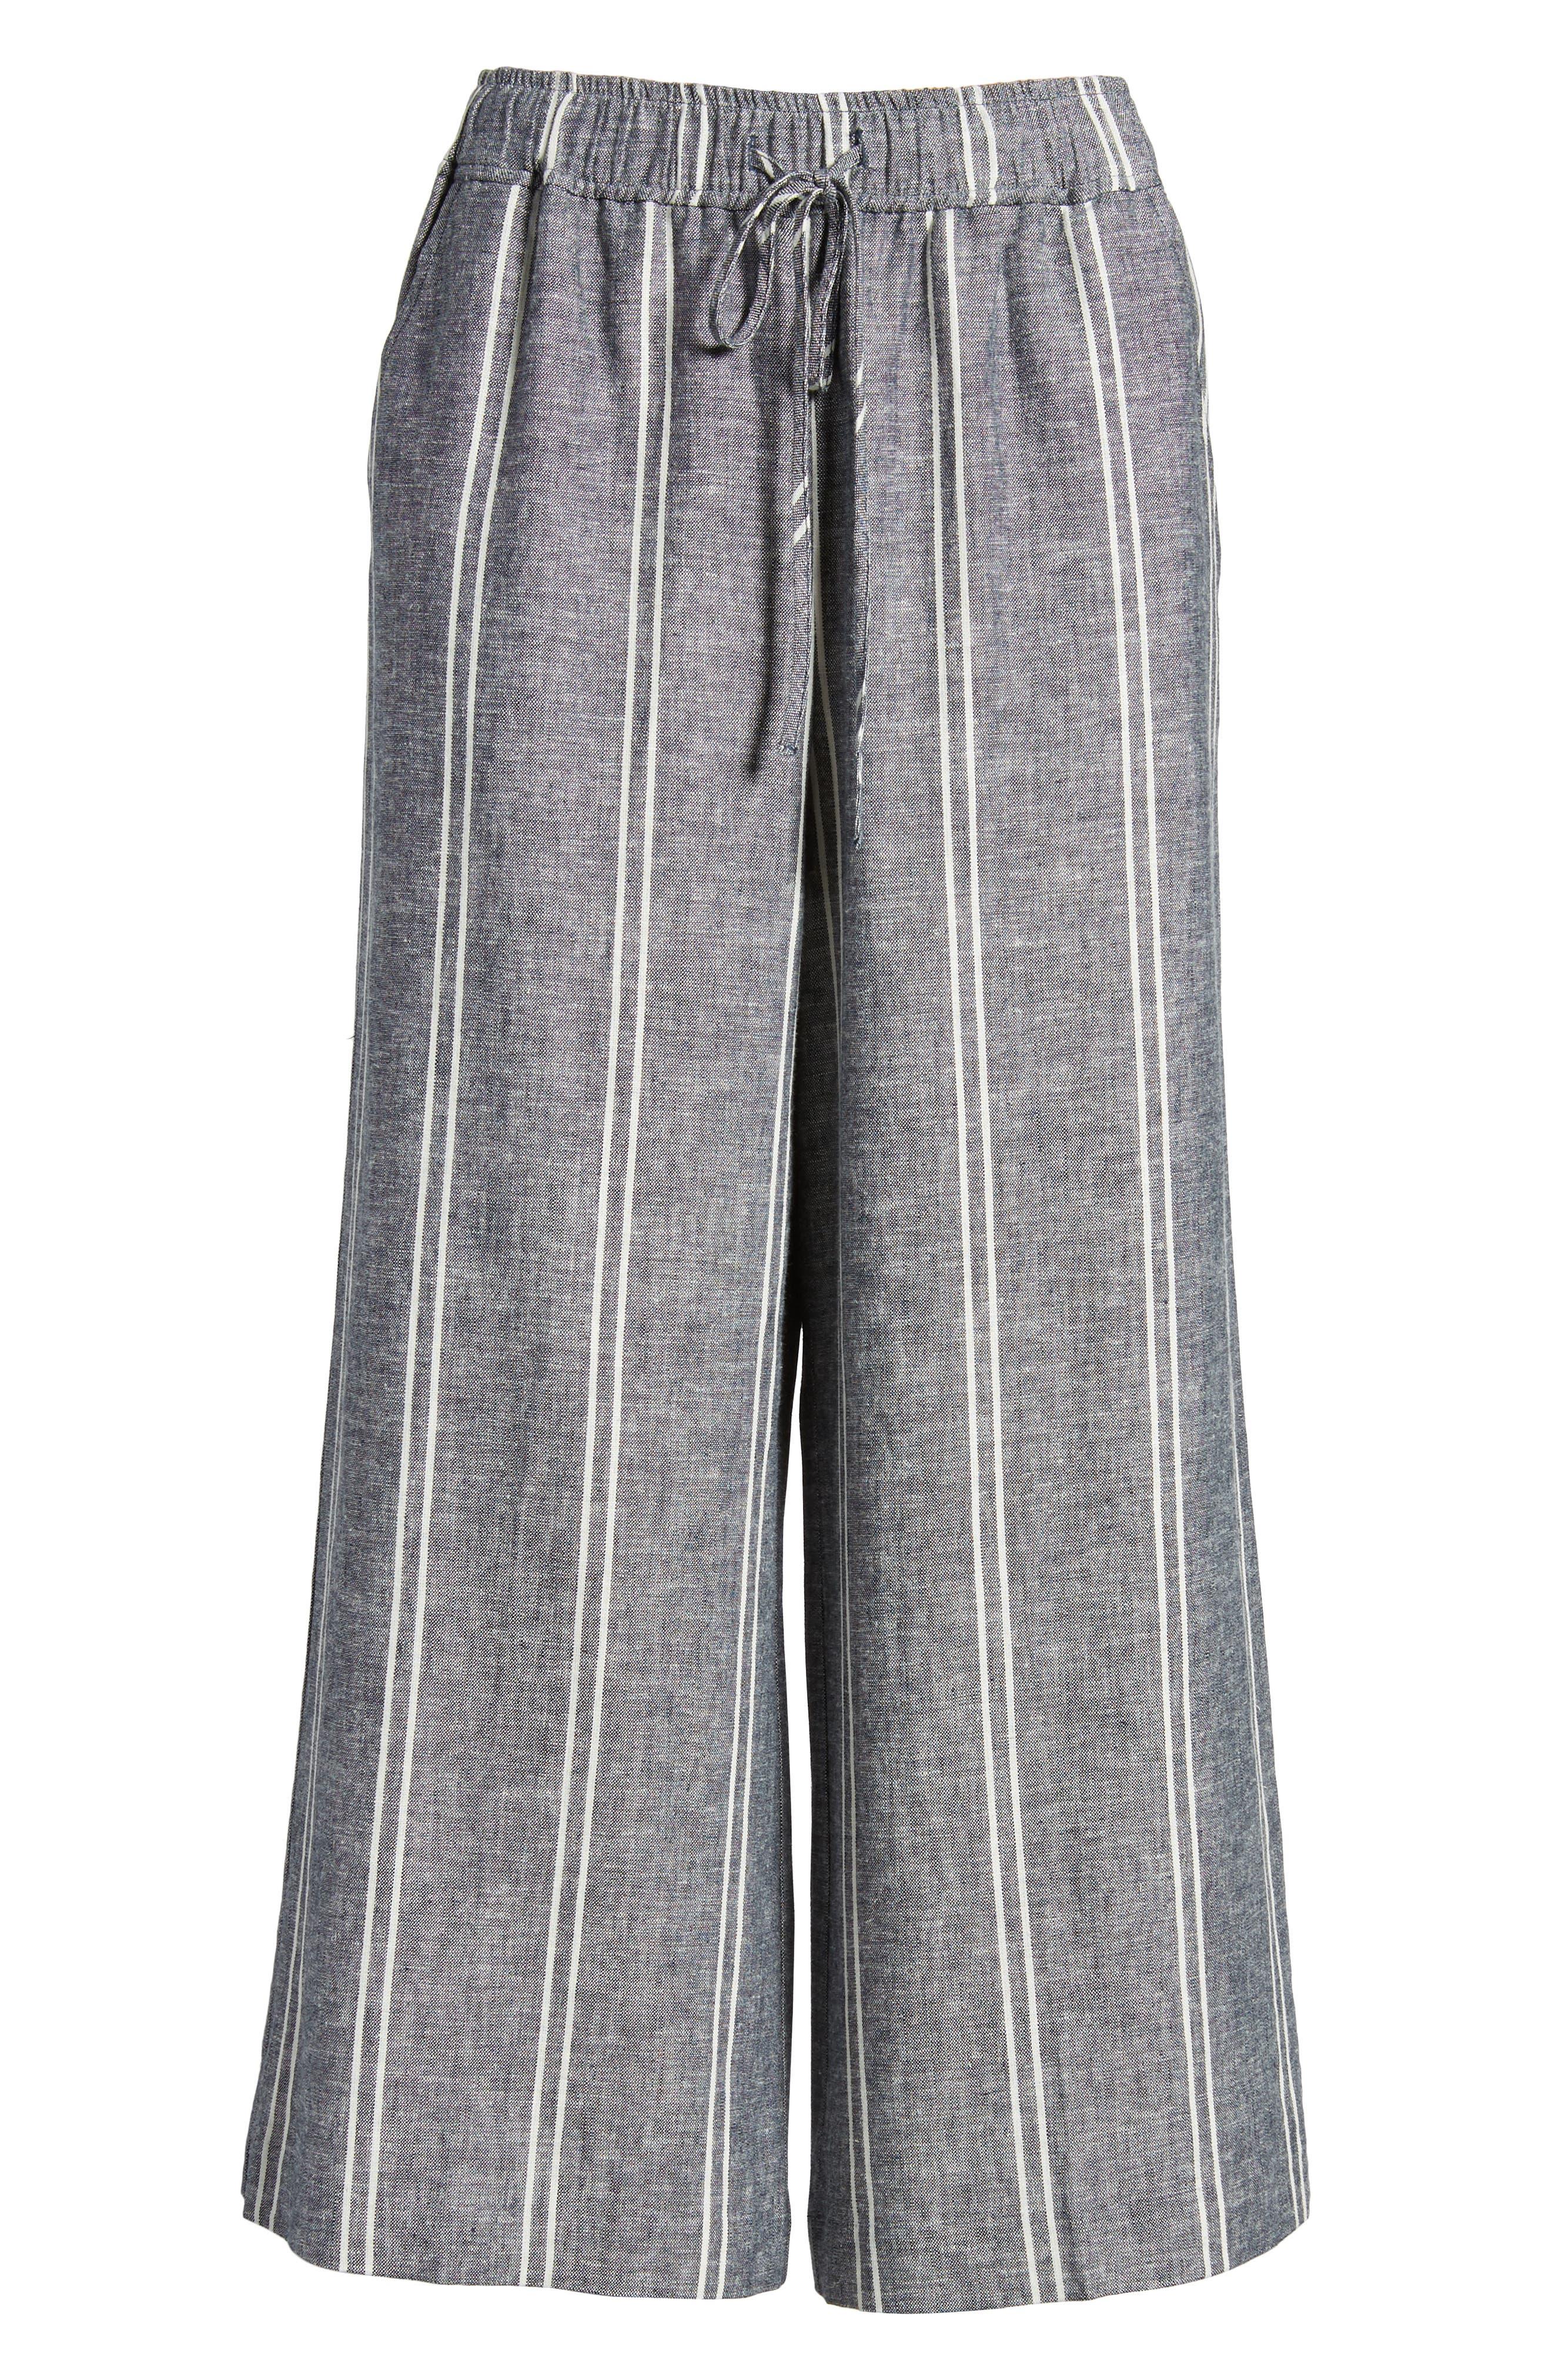 Stripe Linen Blend Culottes,                             Alternate thumbnail 7, color,                             Navy Peacoat Chambray Stripe